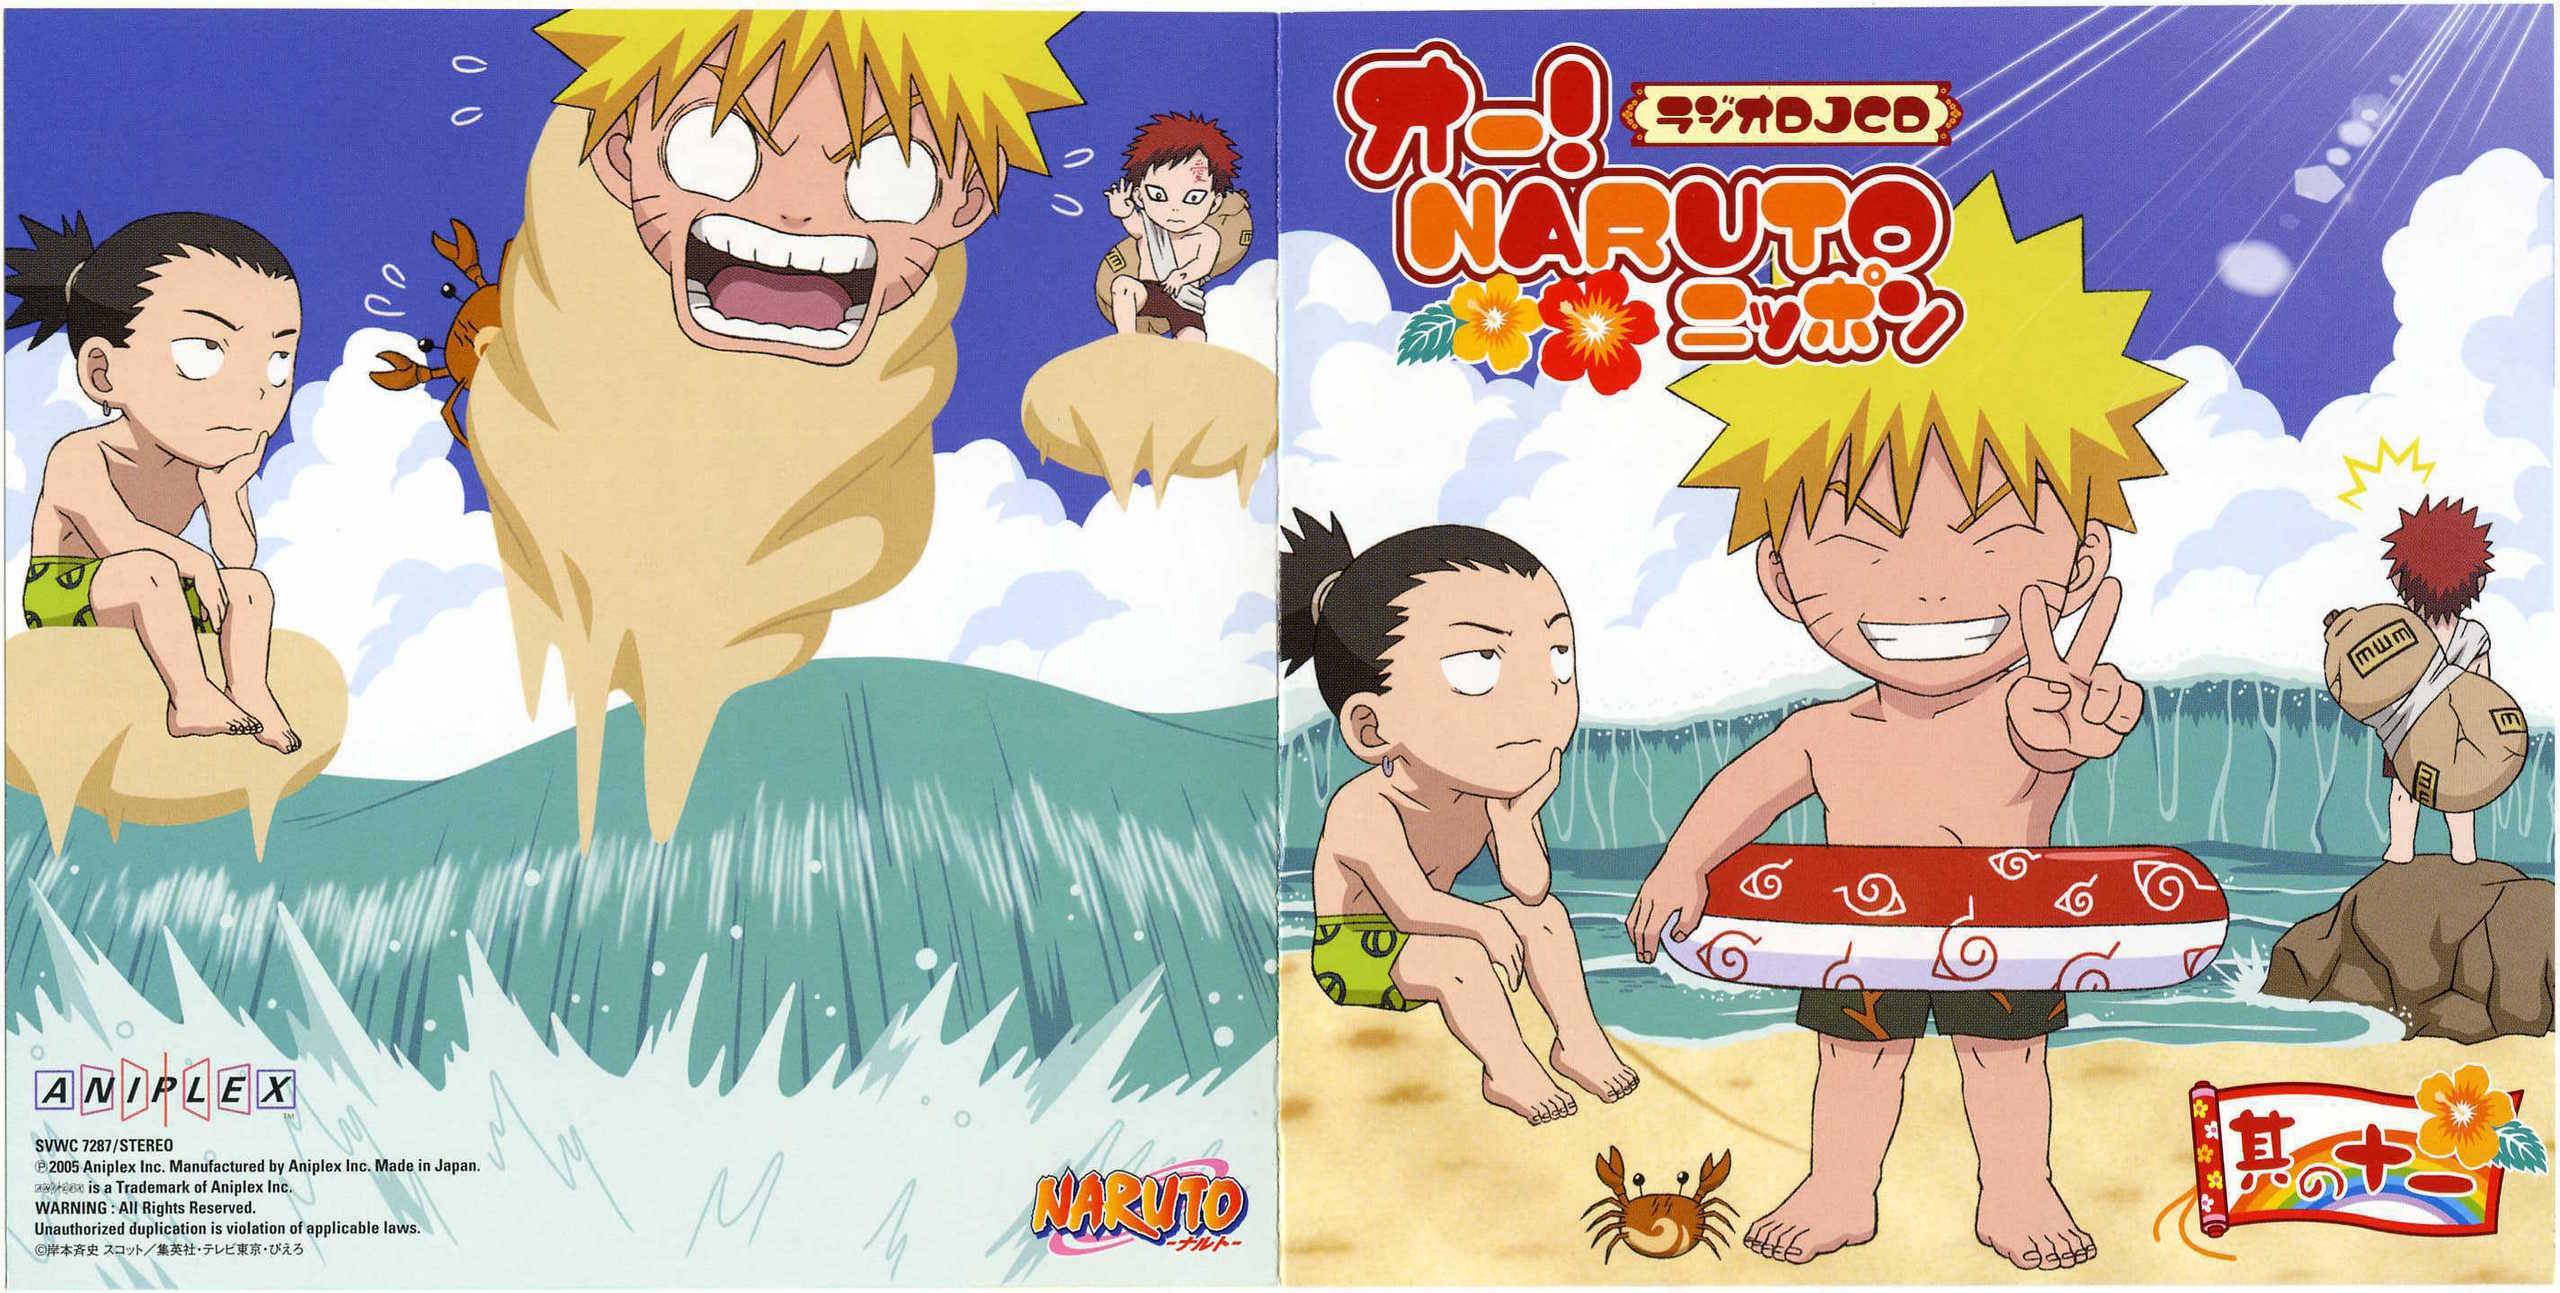 Shikamaru Naruto Gaara Chibi Wallpapers 2560x1293